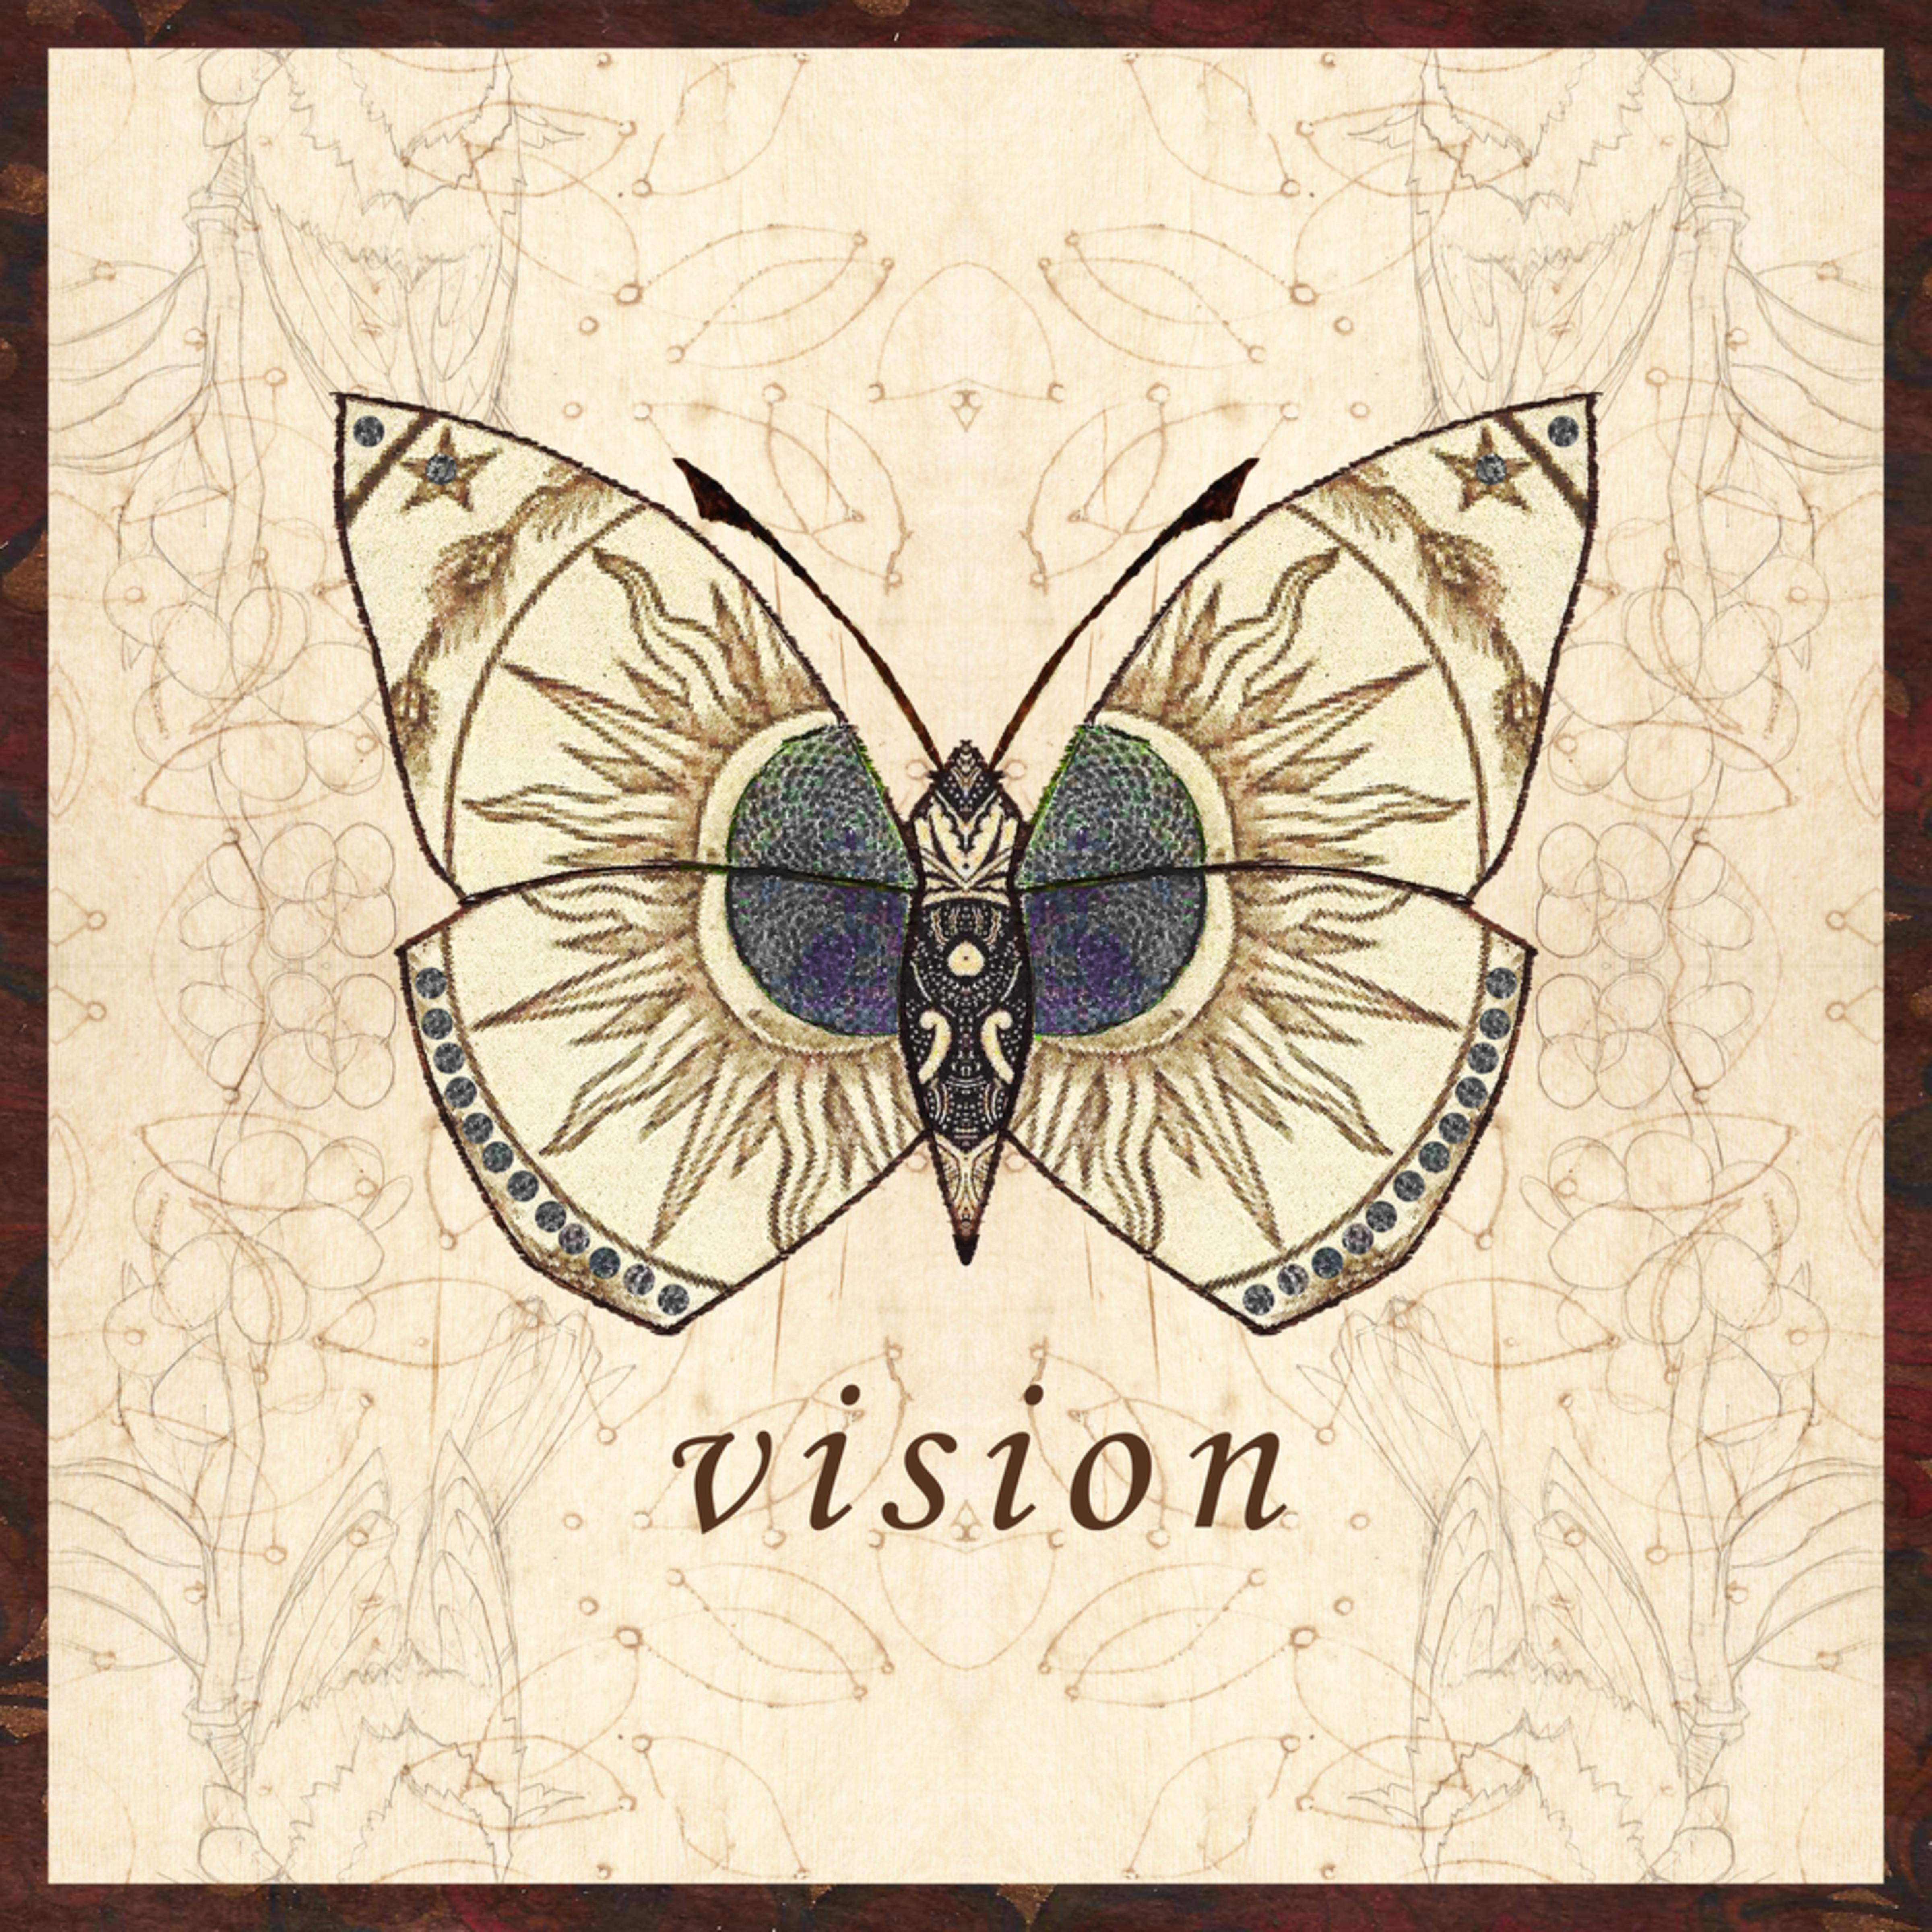 Vision rrbfwd